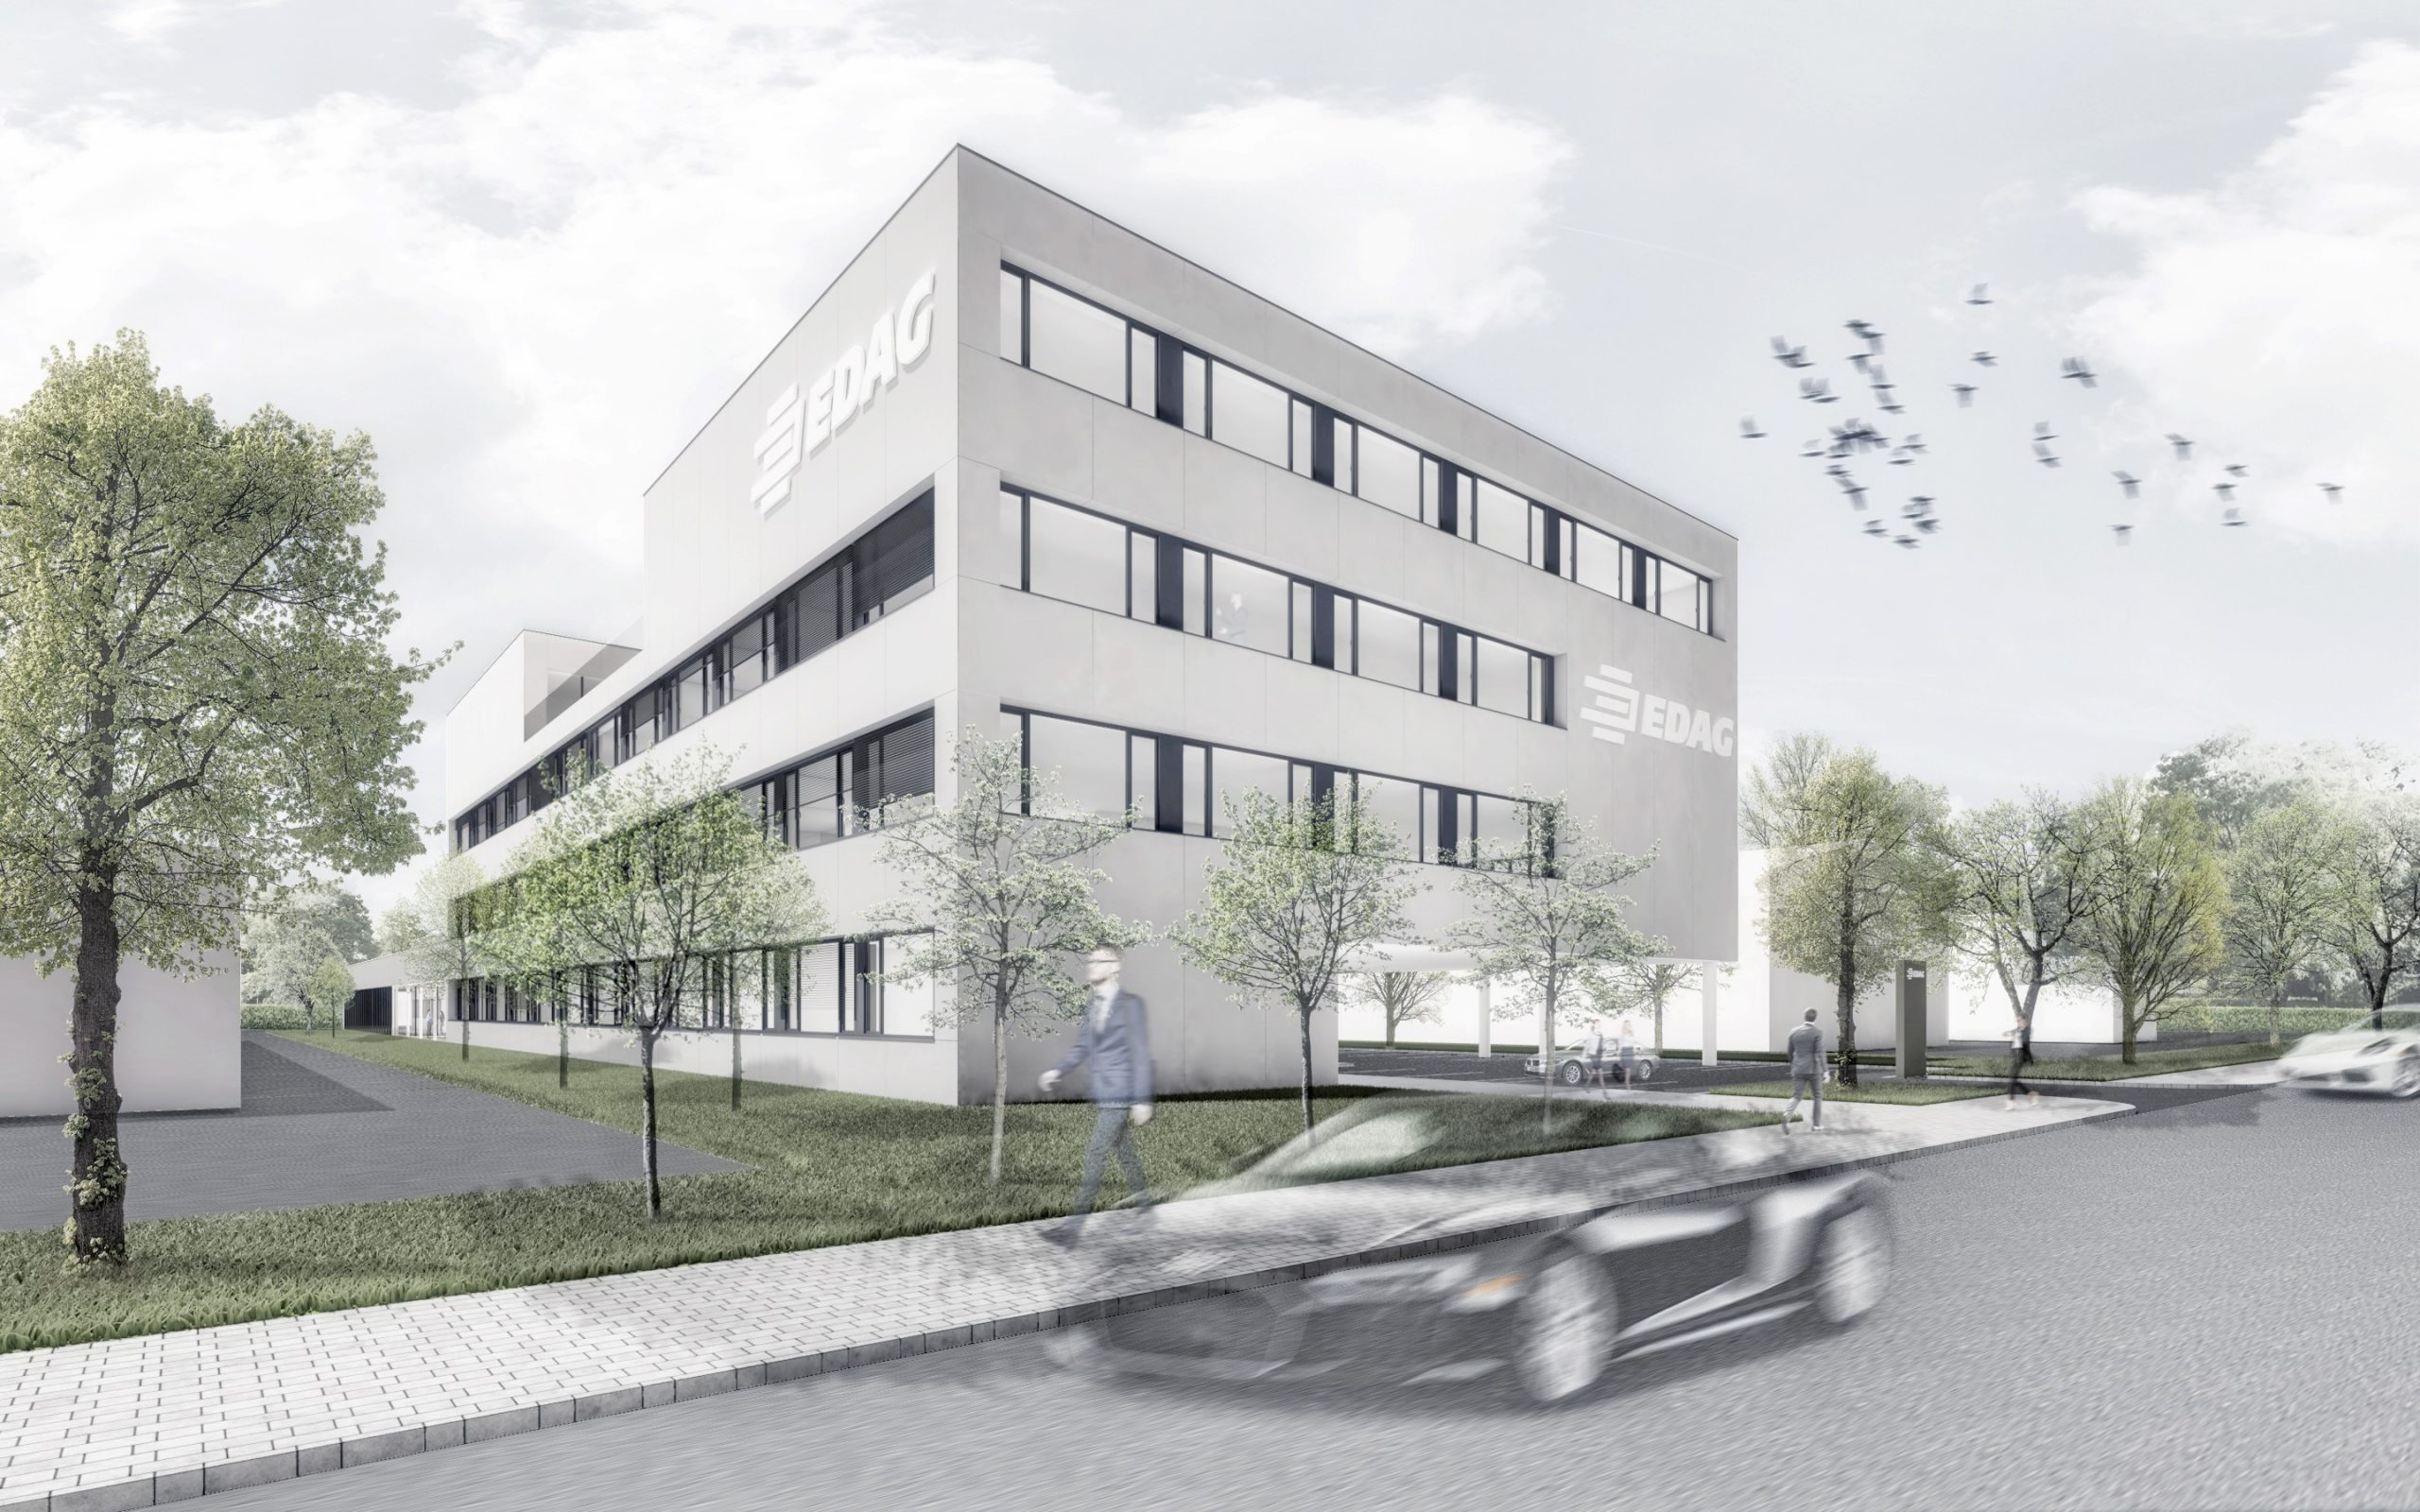 (Bild: EDAG Engineering GmbH)